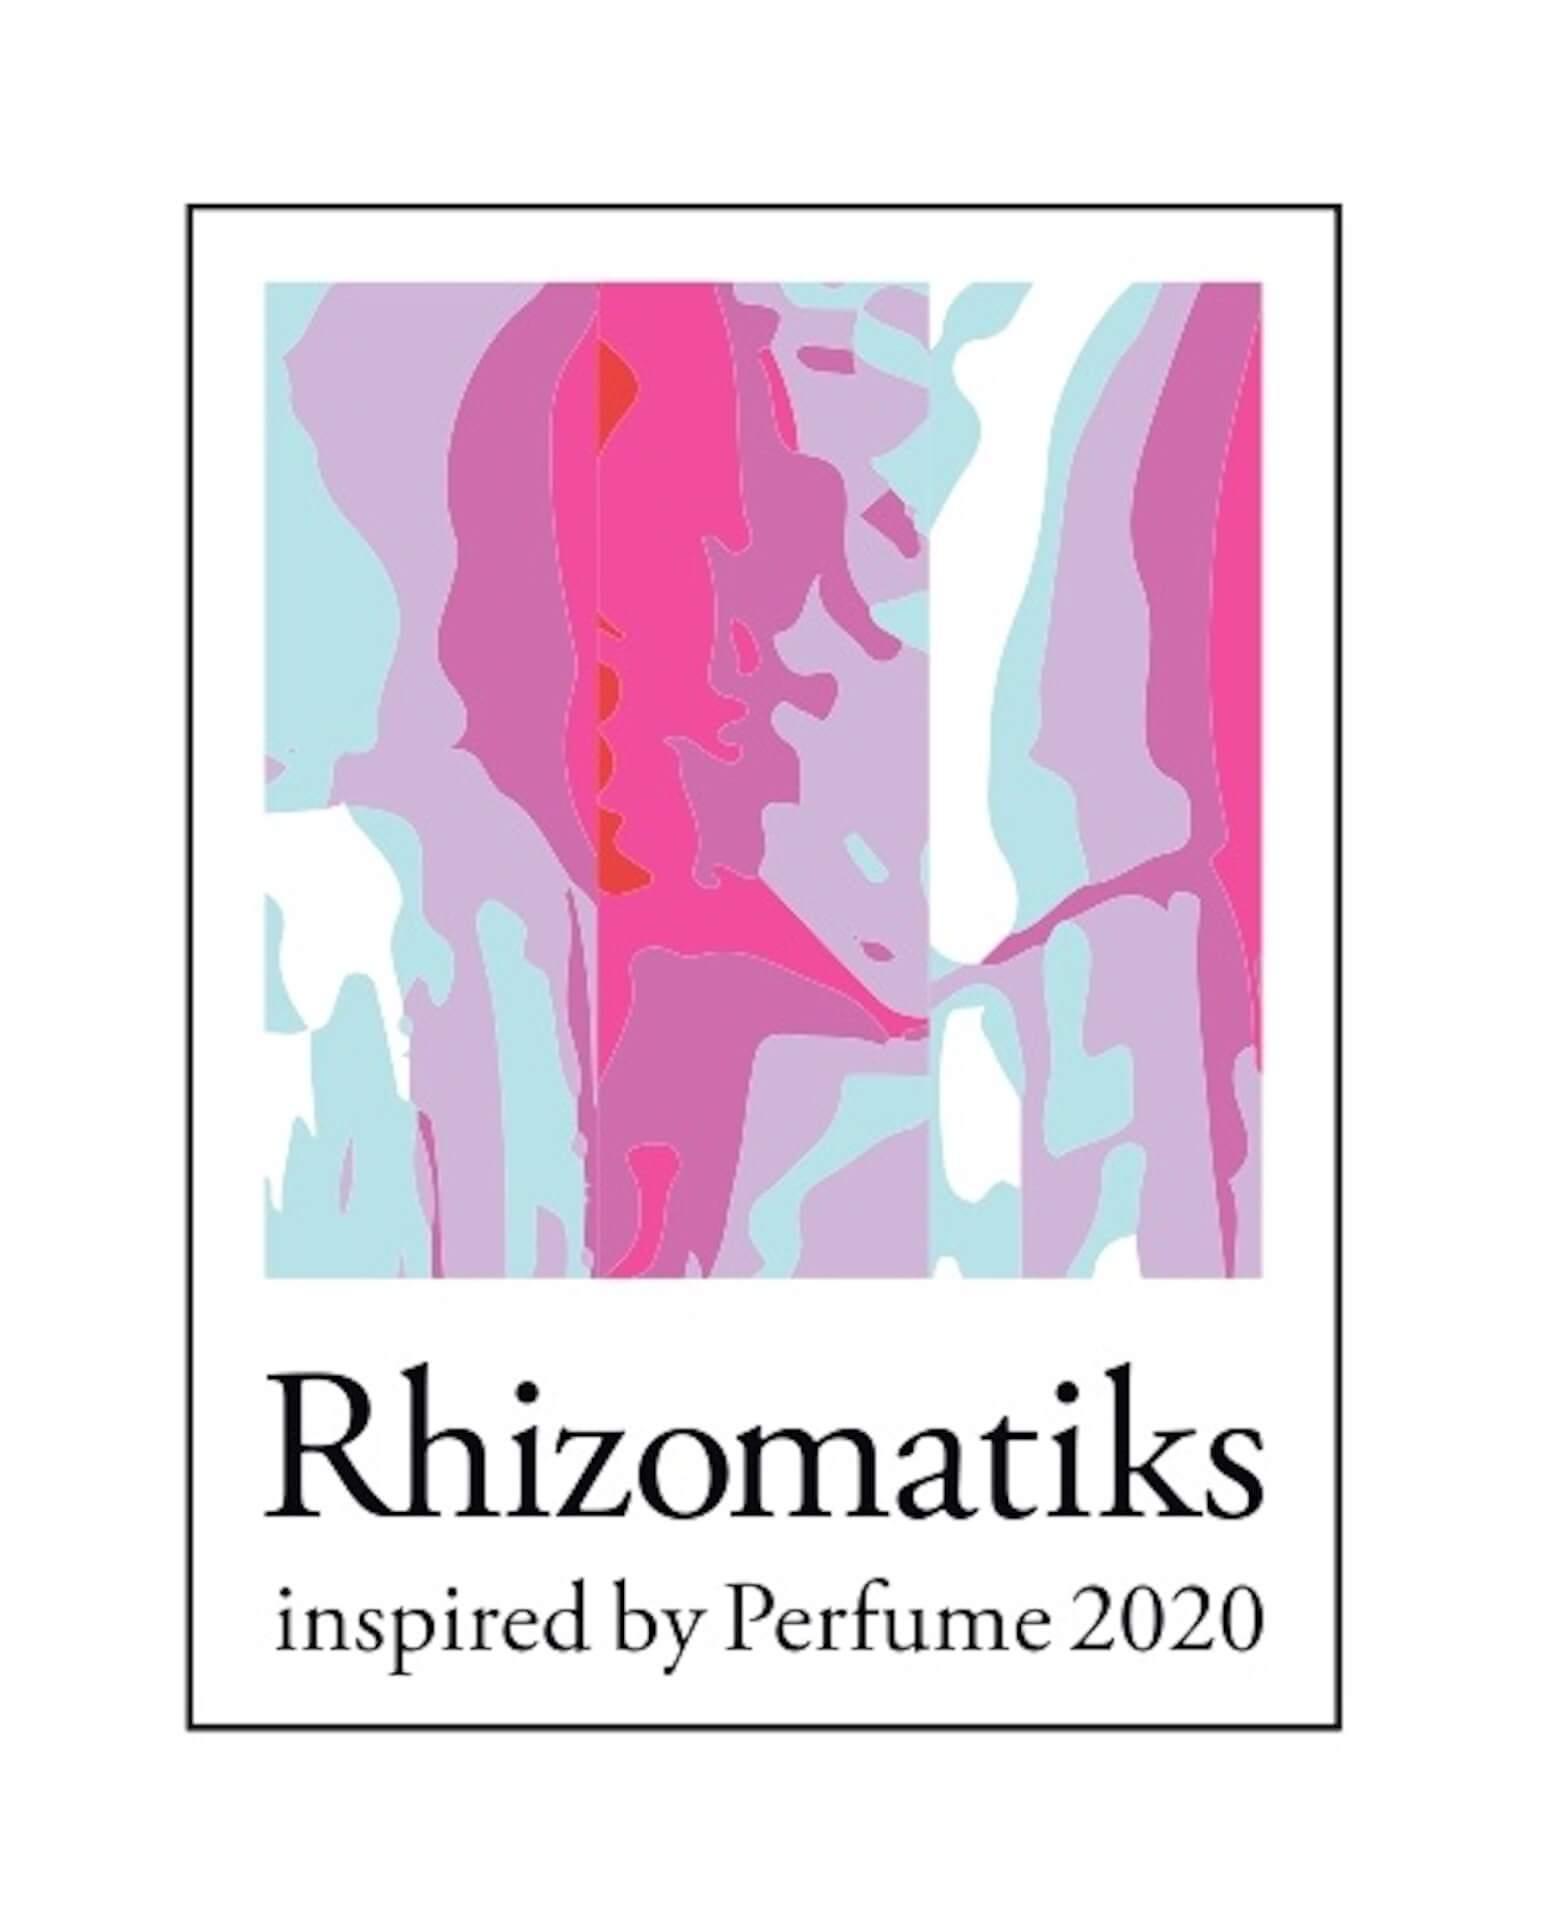 Perfume舞台演出の裏側を体験!<Rhizomatiks inspired by Perfume 2020>が渋谷PARCO MUSEUMで開催! ac200109_rhizomatiksparco_09